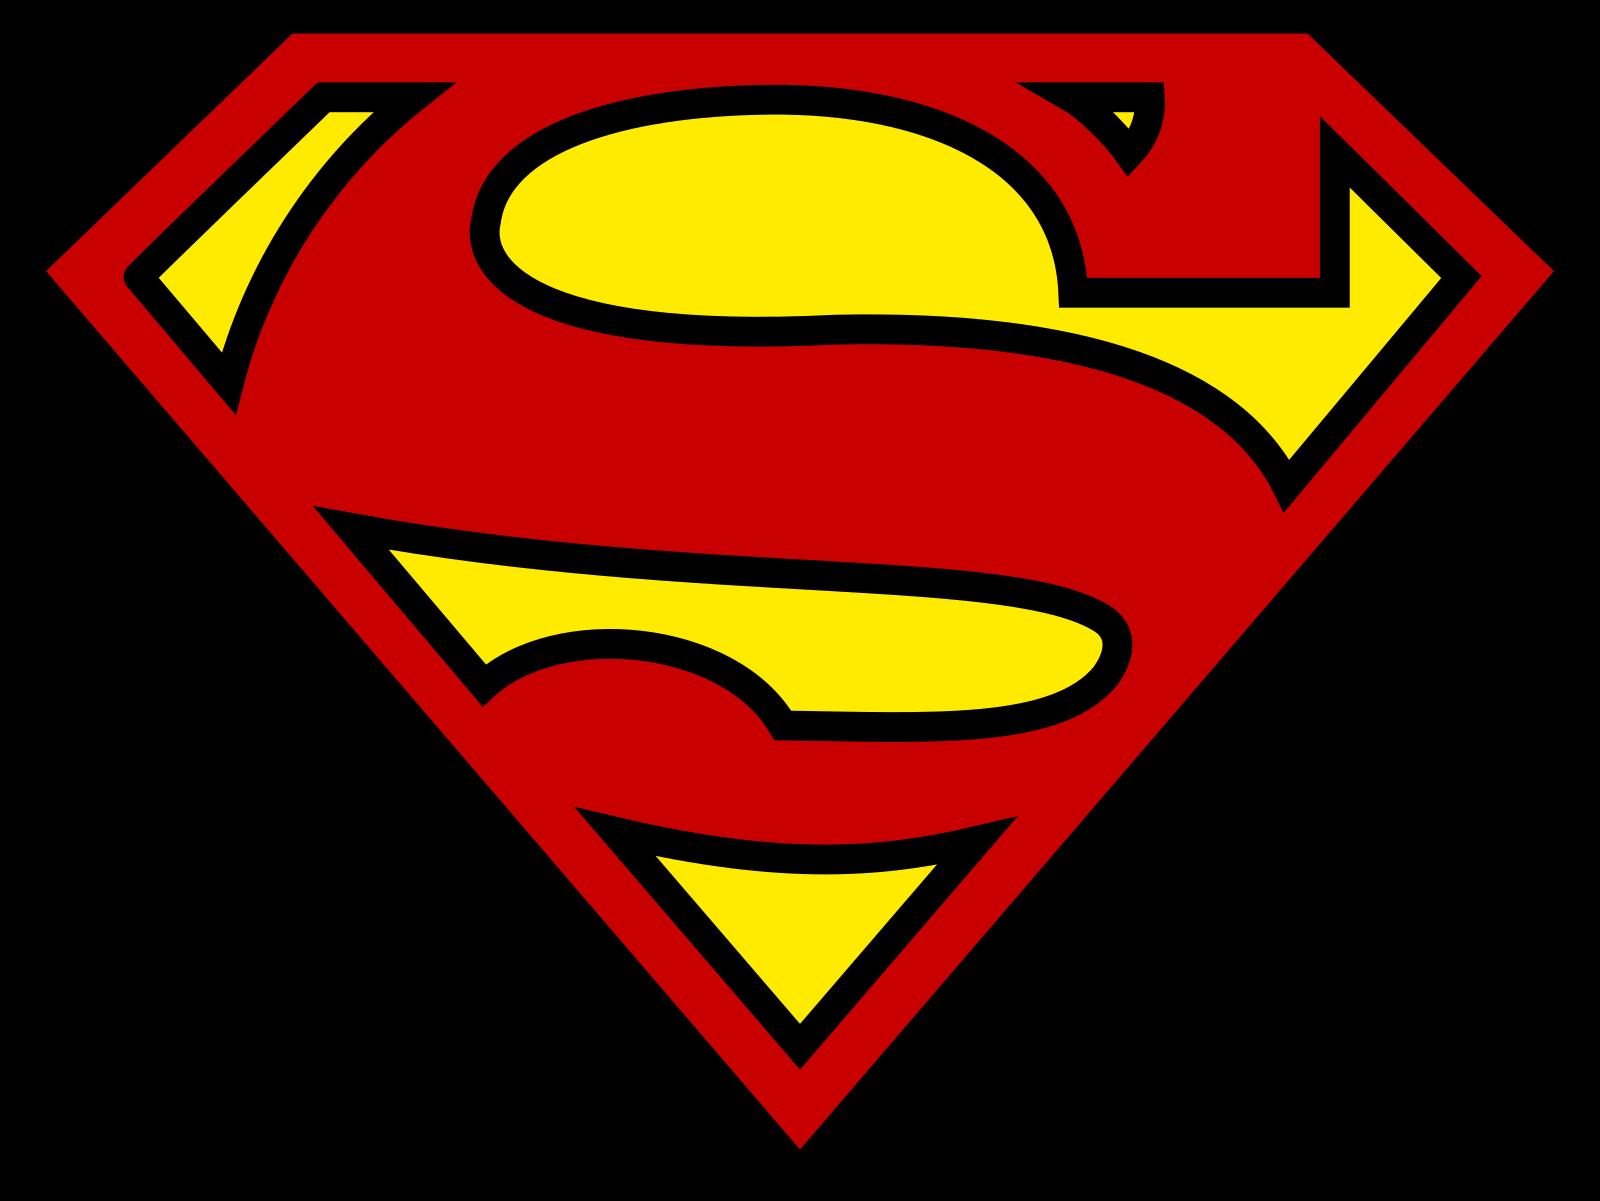 superman logo super homem 3 - Superman Logo - Super Homem Logo